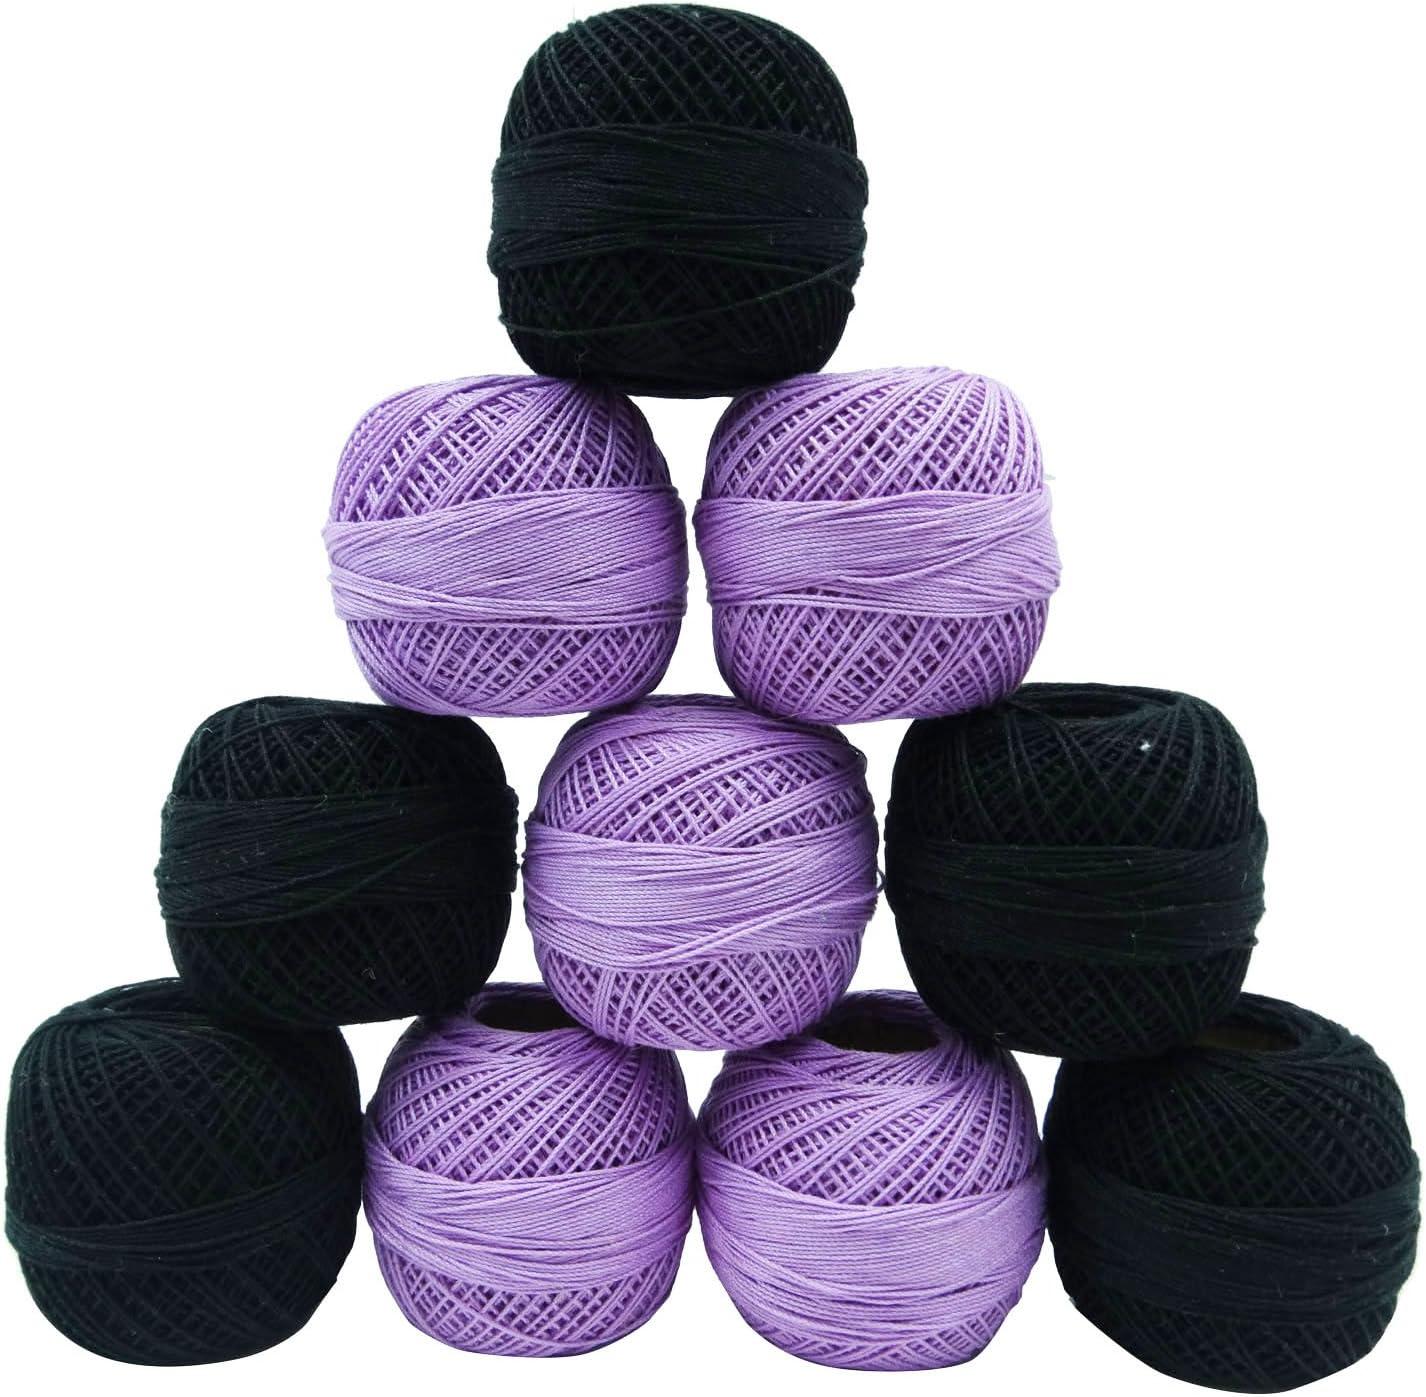 IBA Indianbeautifulart 10 Piezas Negro púrpura del Hilado del Hilo ...